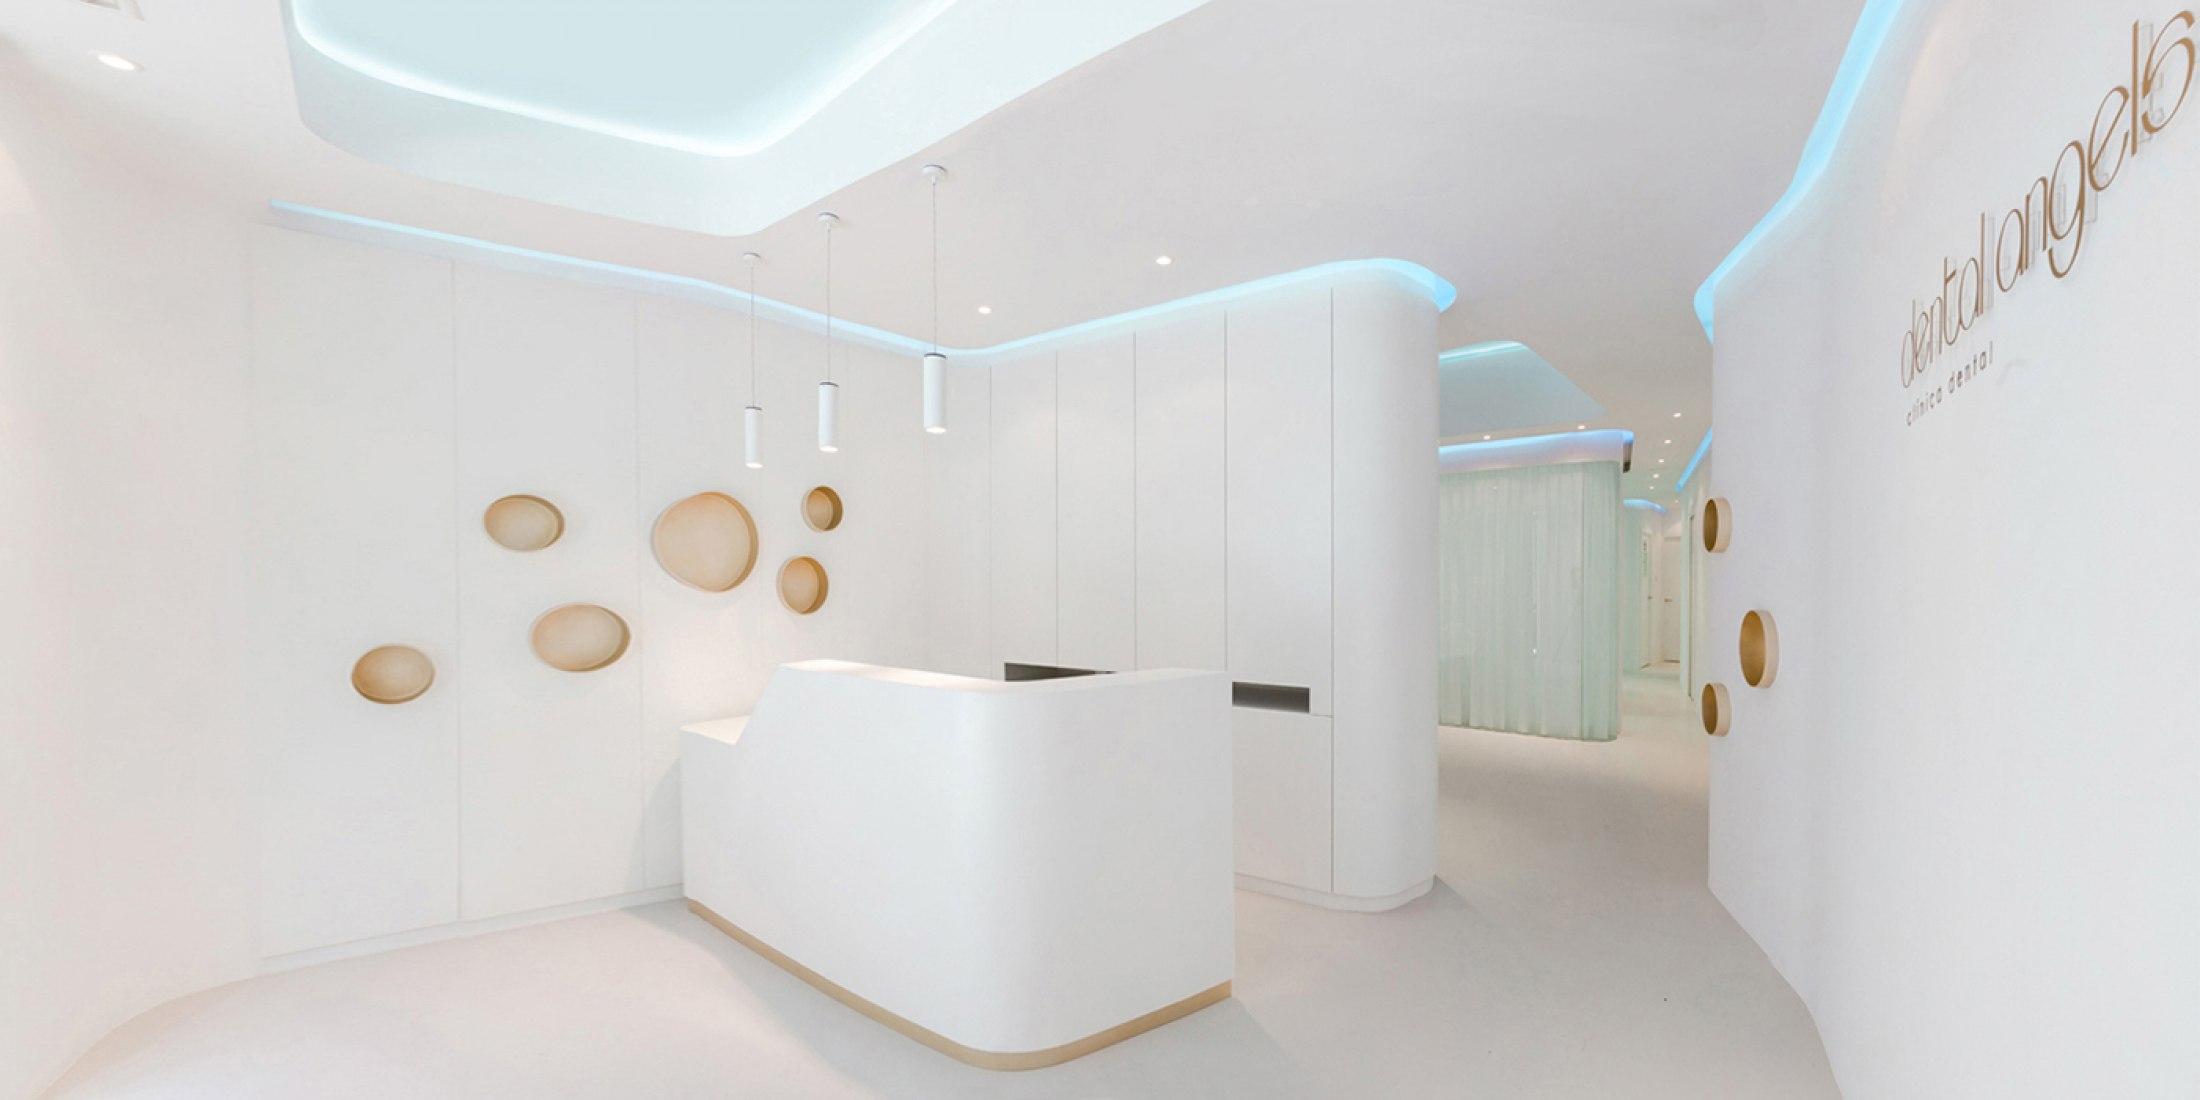 "Dental Office ""Dental Angels"" by YLAB Arquitectos Barcelona. Photography © Ciro Frank Schiappa."